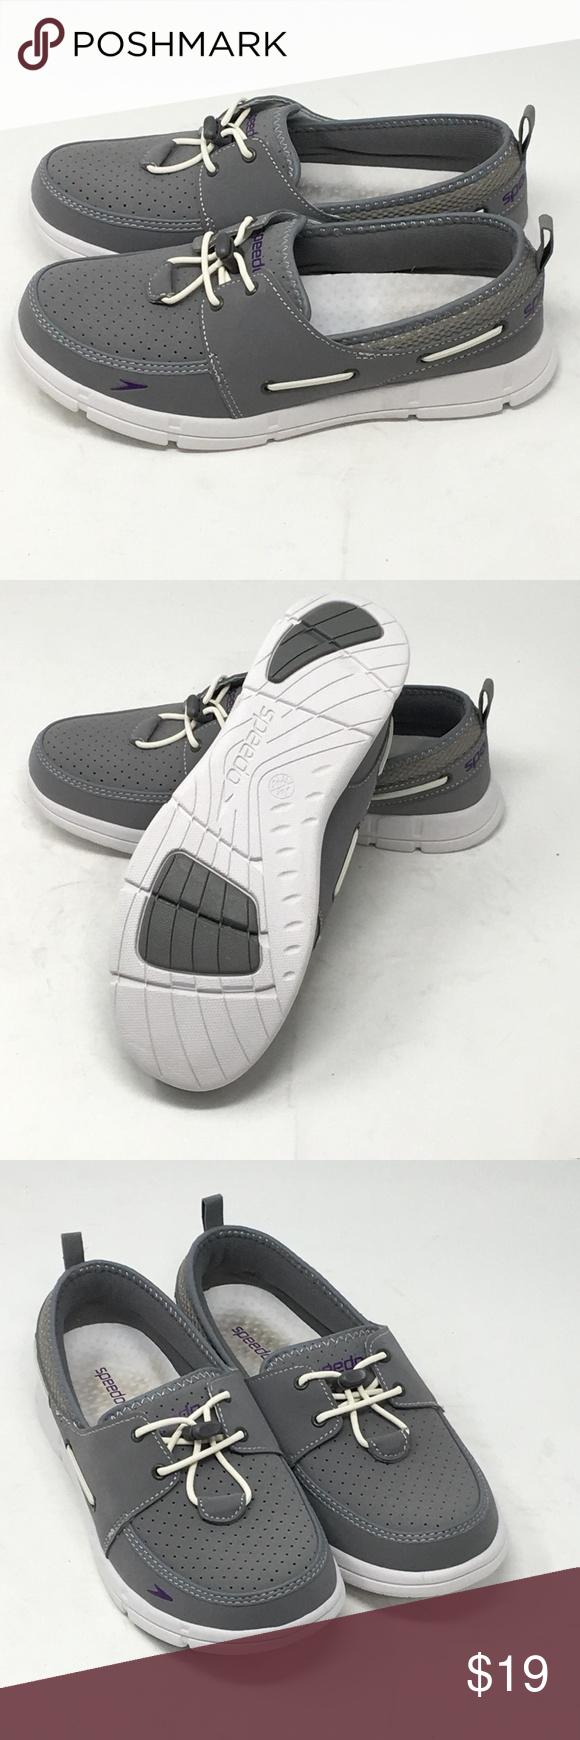 487fb463a378 Speedo Men s Boat Shoes